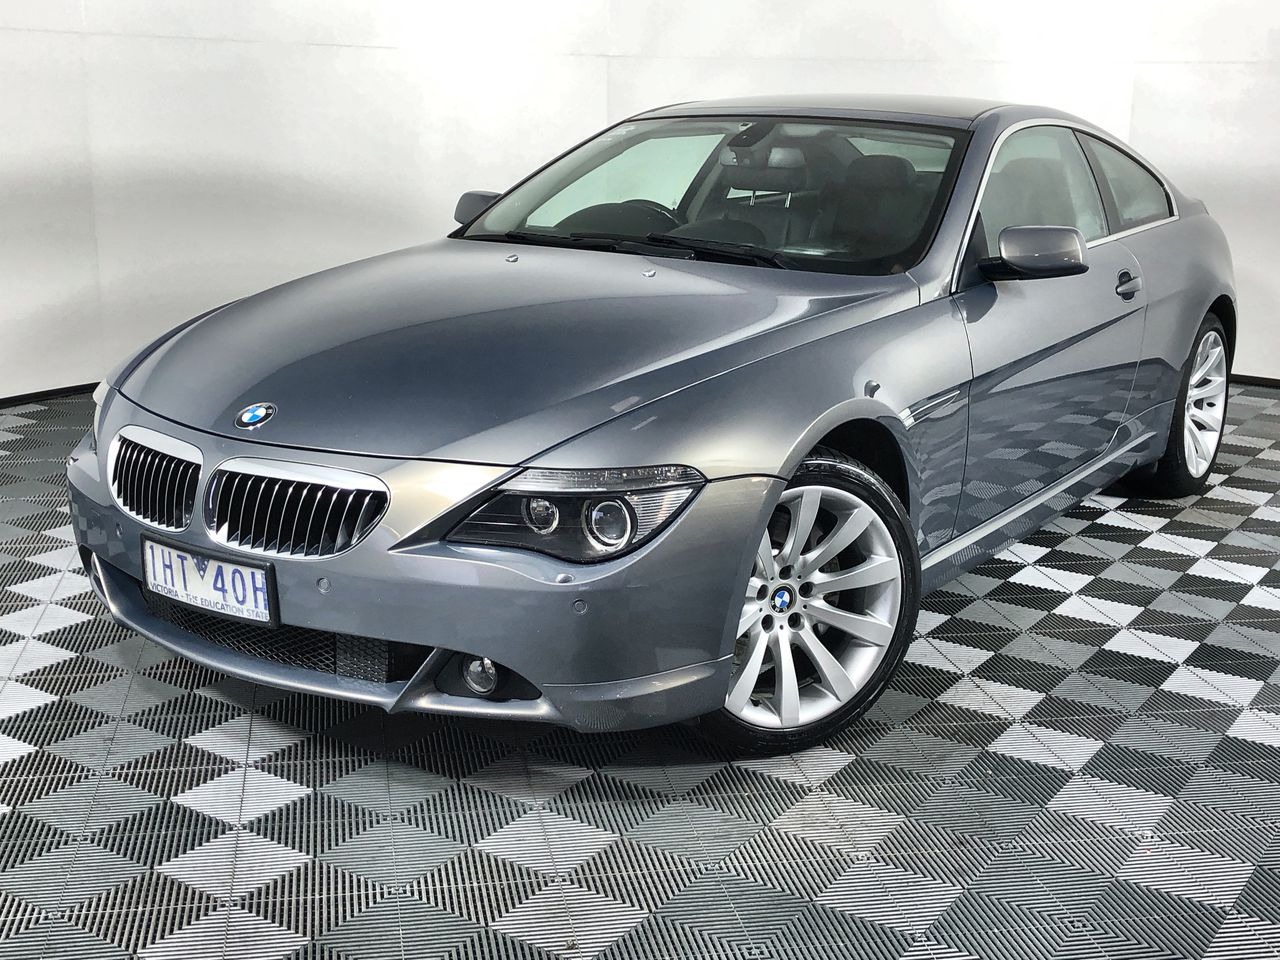 2007 BMW 6 Series 650i E63 Automatic Coupe